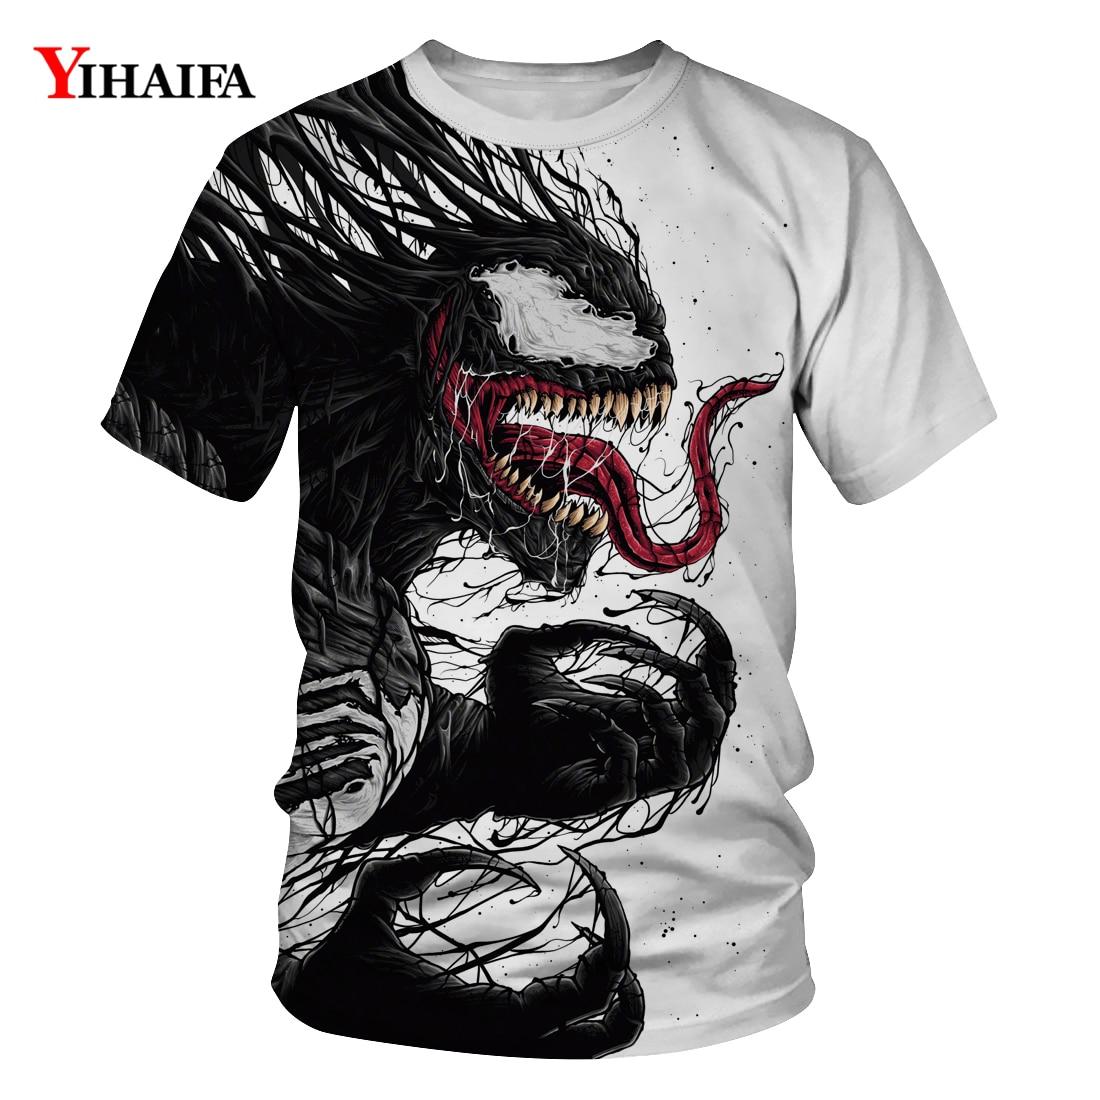 2019 T Shirt Stylish Men Newest Venom Marvel T-shirt 3D Printed T-shirts Women Casual Fitness Tees Tops